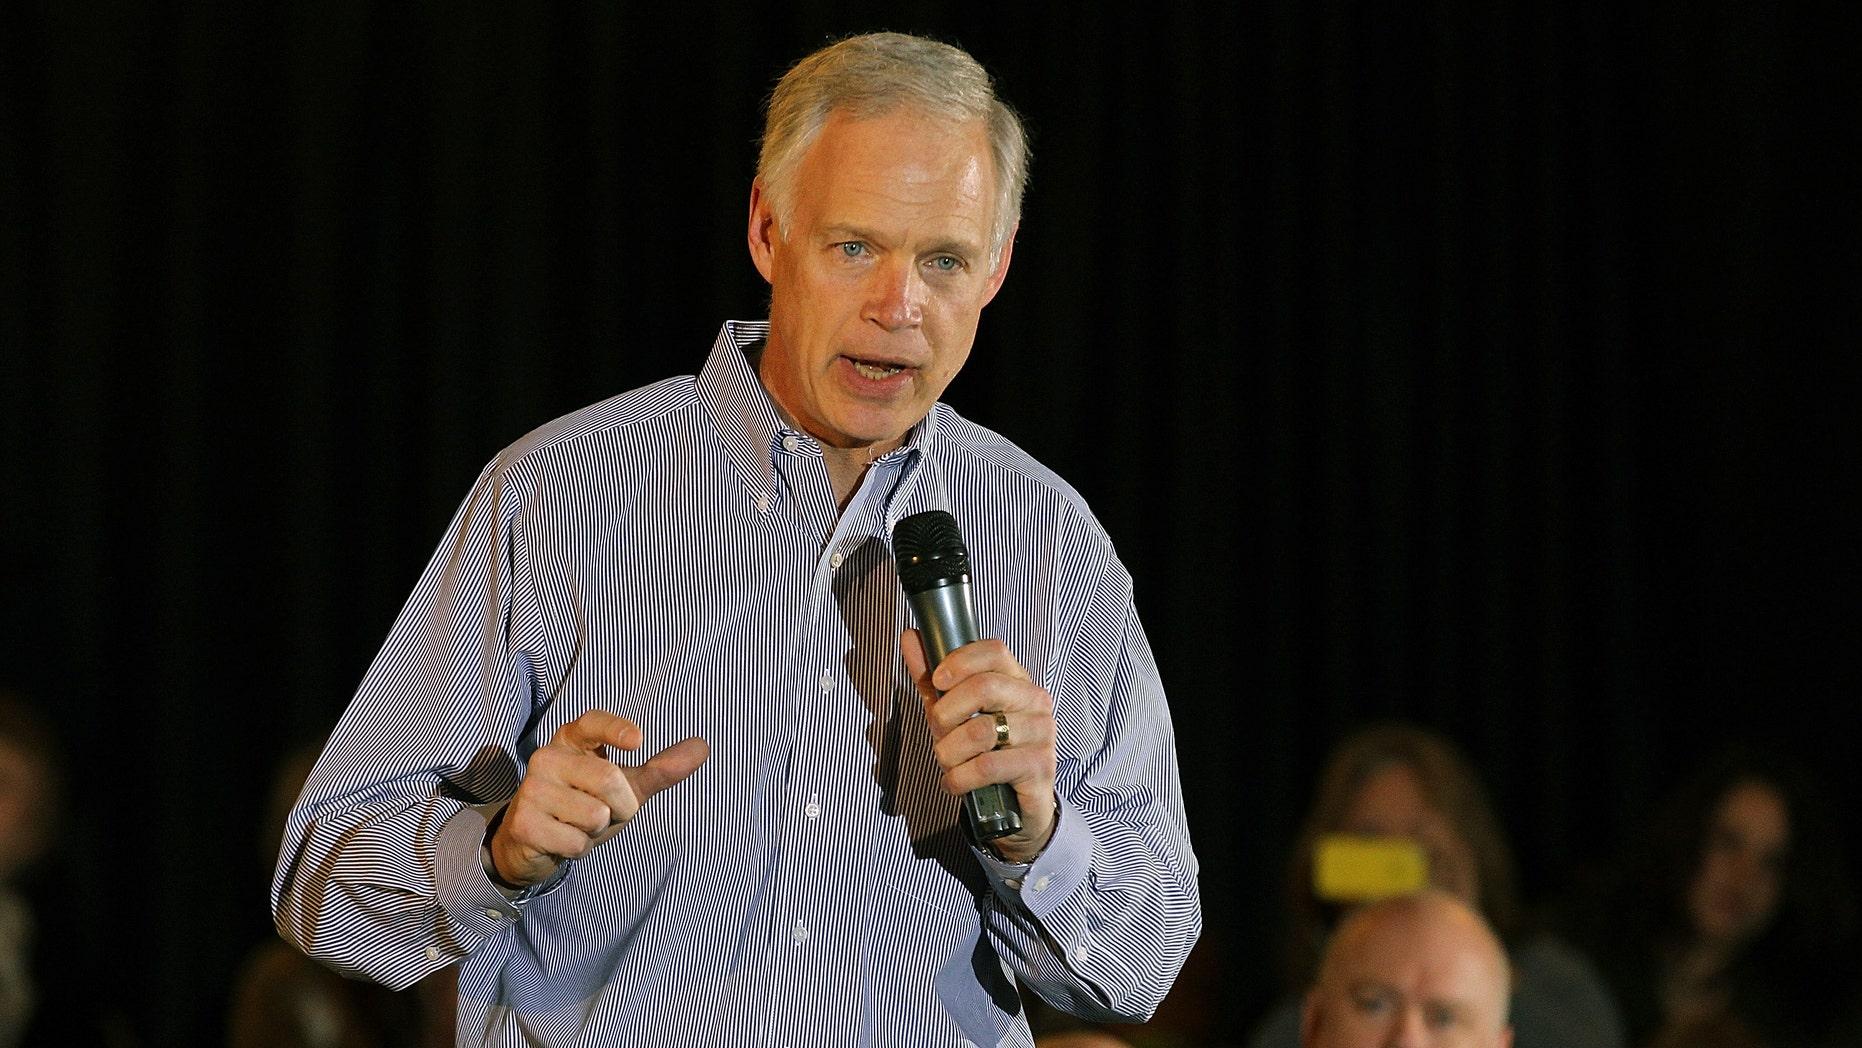 U.S. Sen. Ron Johnson (R-WI) in an April 2012 file photo.